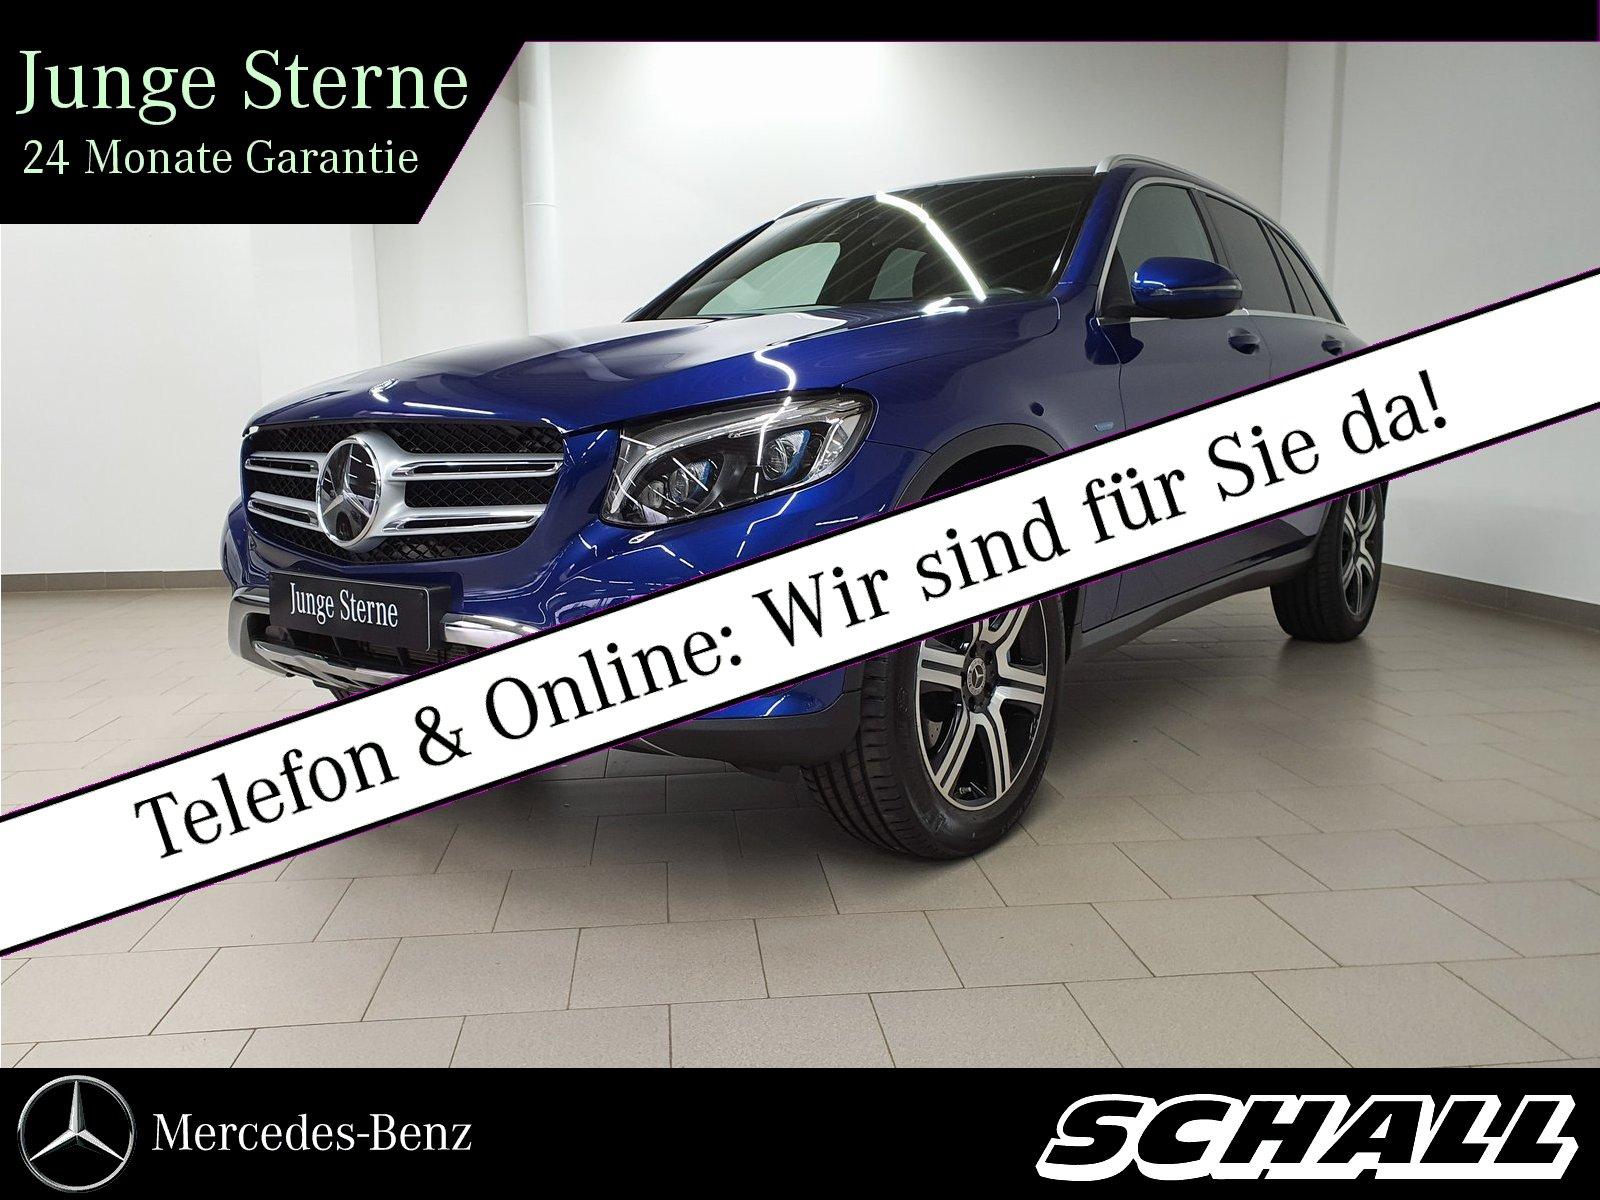 Mercedes-Benz GLC 350 e 4M PANO/DISTRONIC/LED INTELL./KAMERA, Jahr 2016, Hybrid